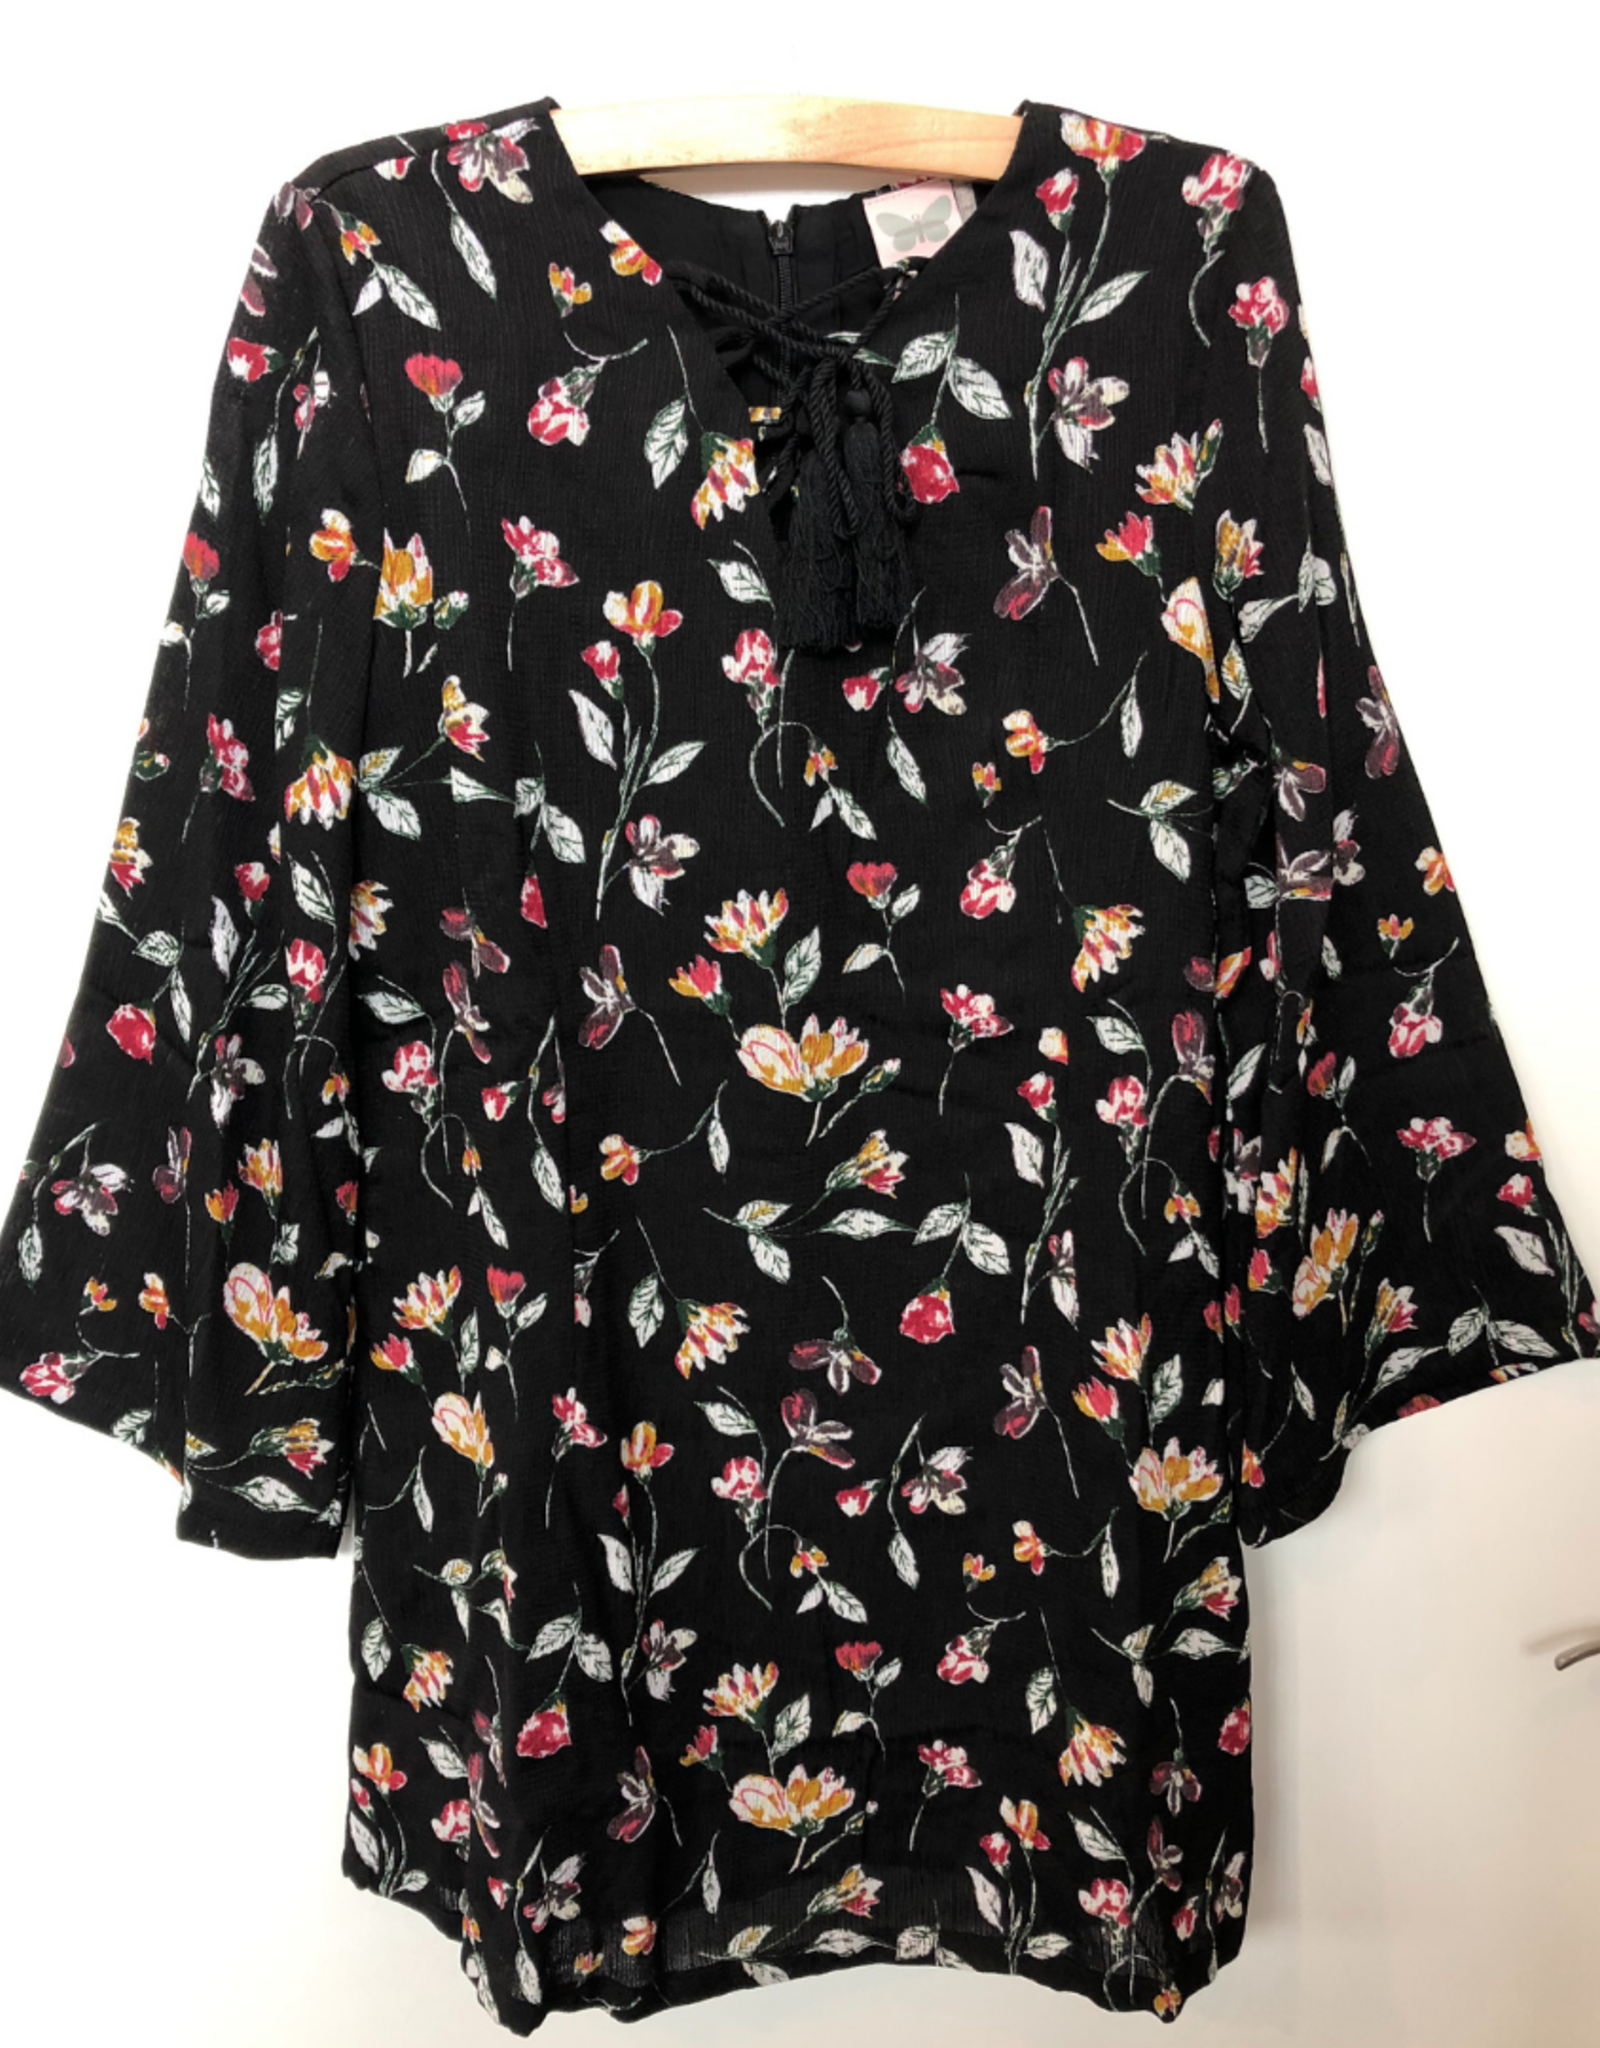 For All Seasons Black Floral Dress